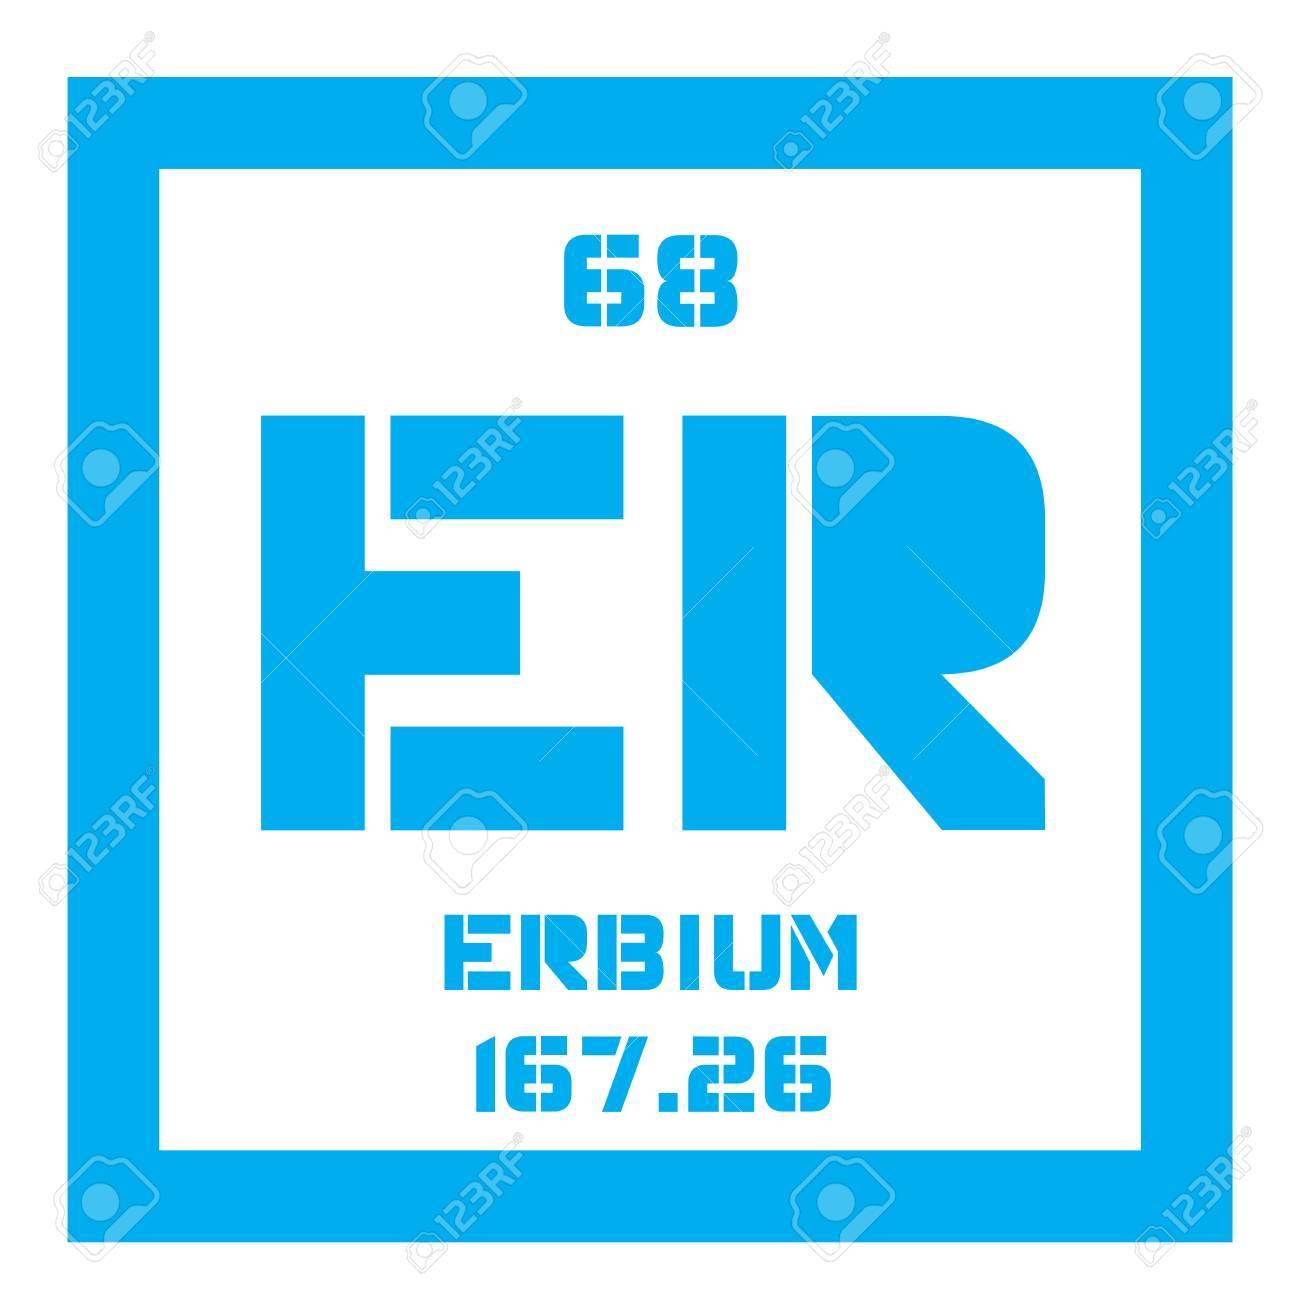 Erbium chemical element rare earth element colored icon with erbium chemical element rare earth element colored icon with atomic number and atomic weight urtaz Images